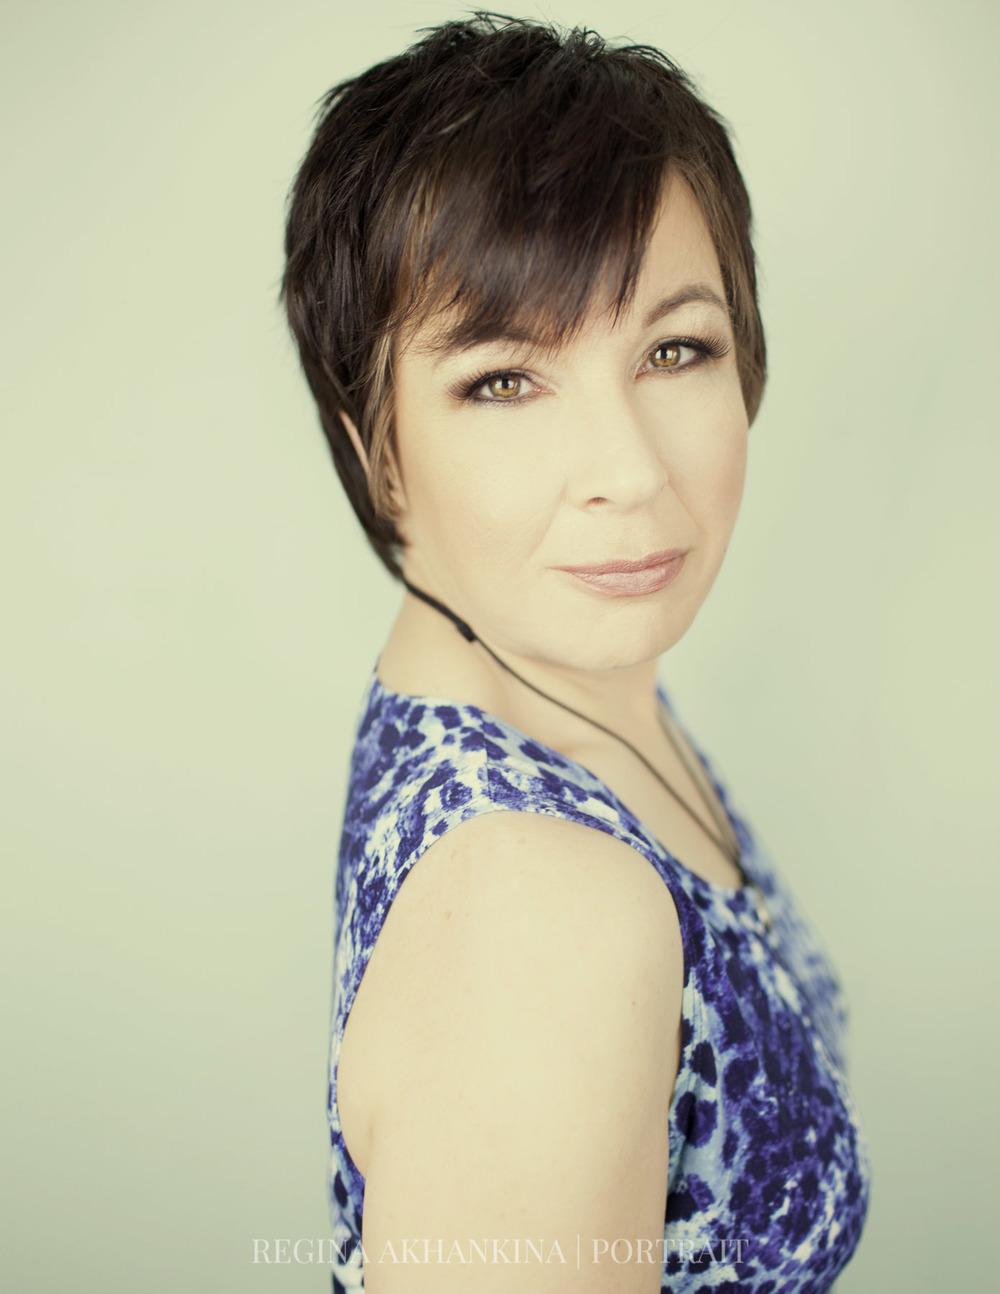 Portrait of Debra Petersen. Regina Akhankina, Morden, Manitoba, 2015